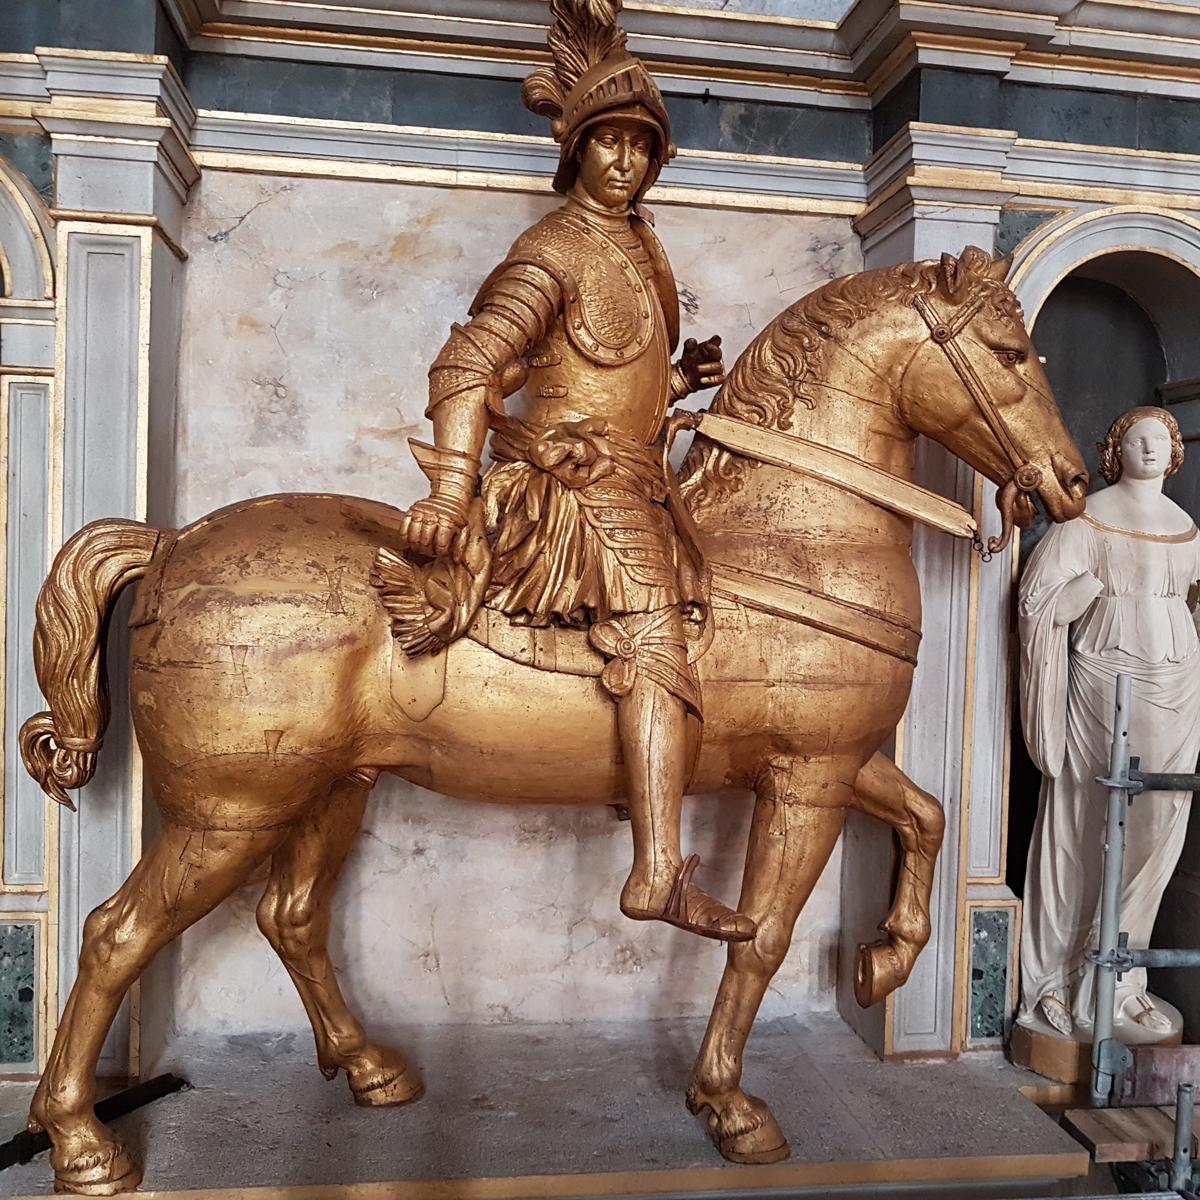 RL, CSP, CSE, DL – Restauro Monumento Orsini, Chiesa SS. Giovanni e Paolo, Venetian Heritage, Venezia, 2016